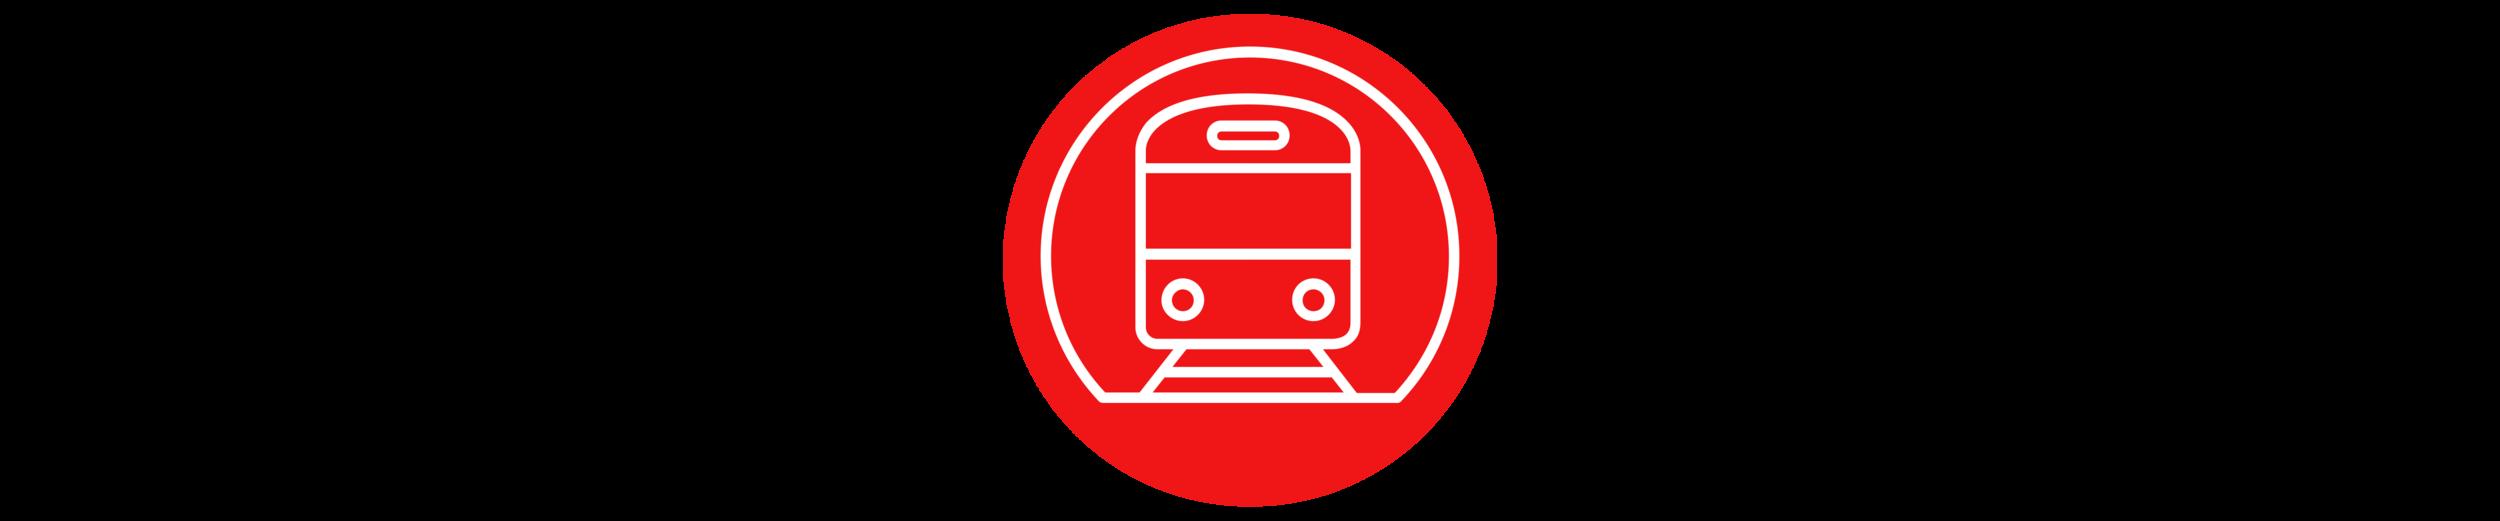 Red Line - Subway